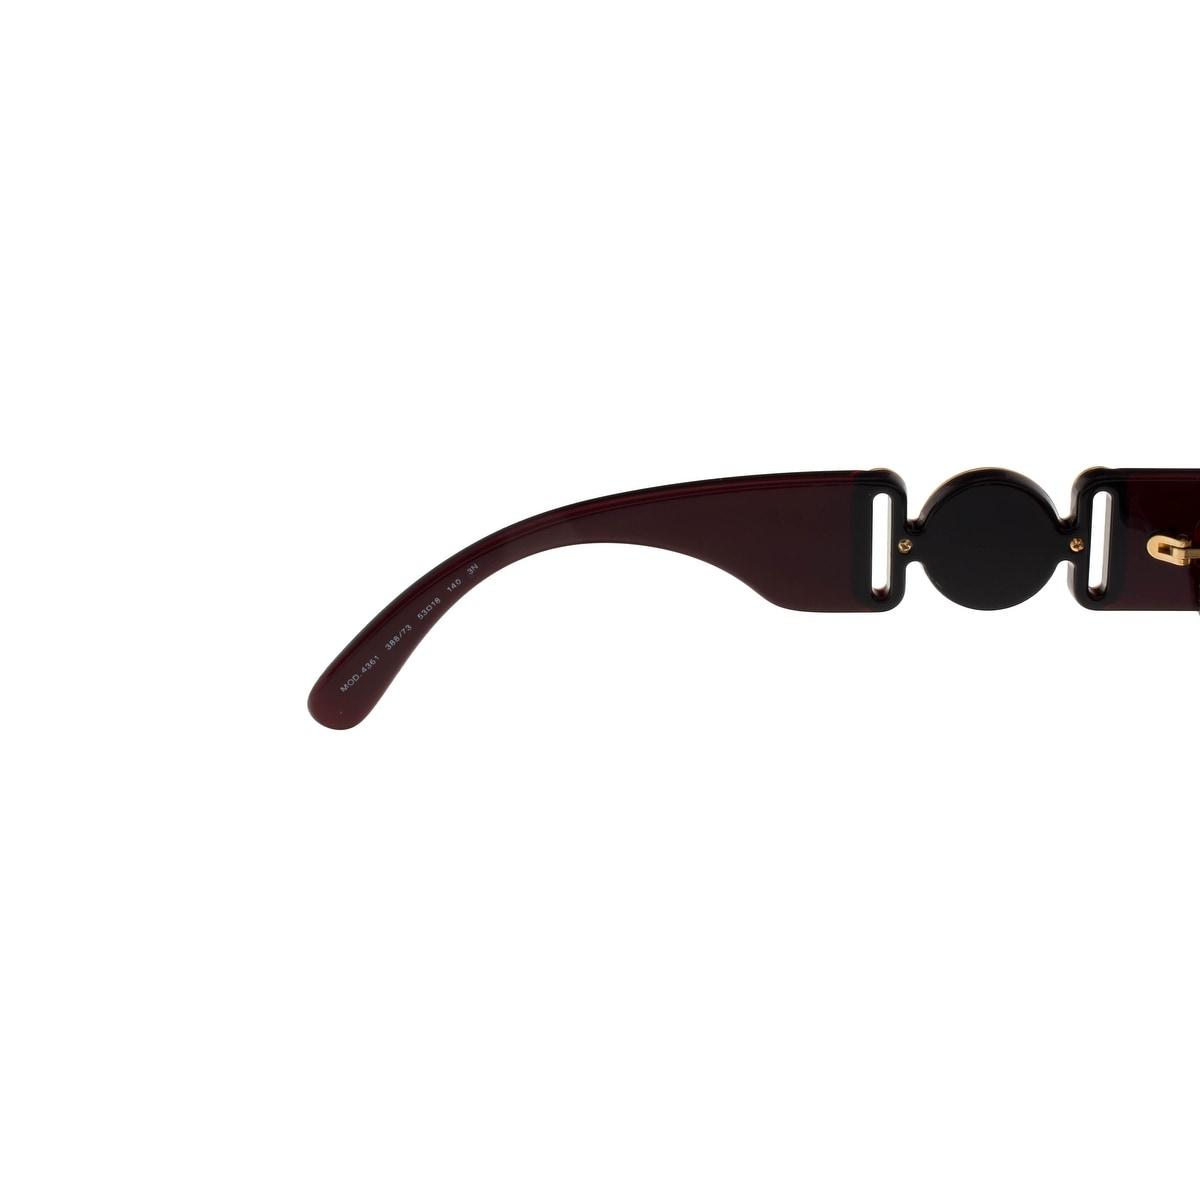 a38d7c997a4e Shop Versace VE4361 388 73 TRANSPARENT RED Irregular Sunglasses - 53-18-140  - Free Shipping Today - Overstock - 26951093